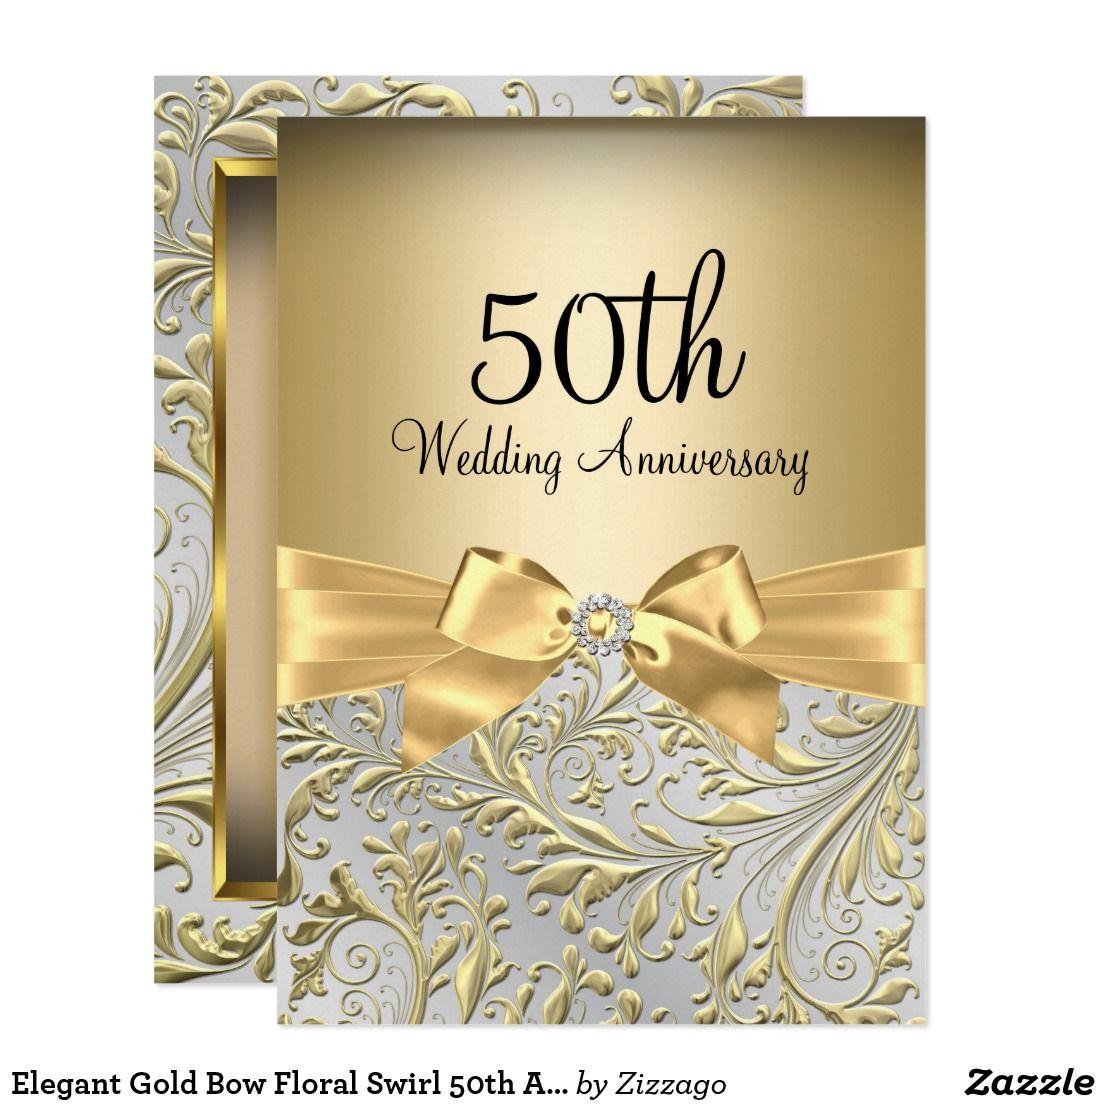 Elegant Gold Bow Floral Swirl 50th Anniversary Invitation Go